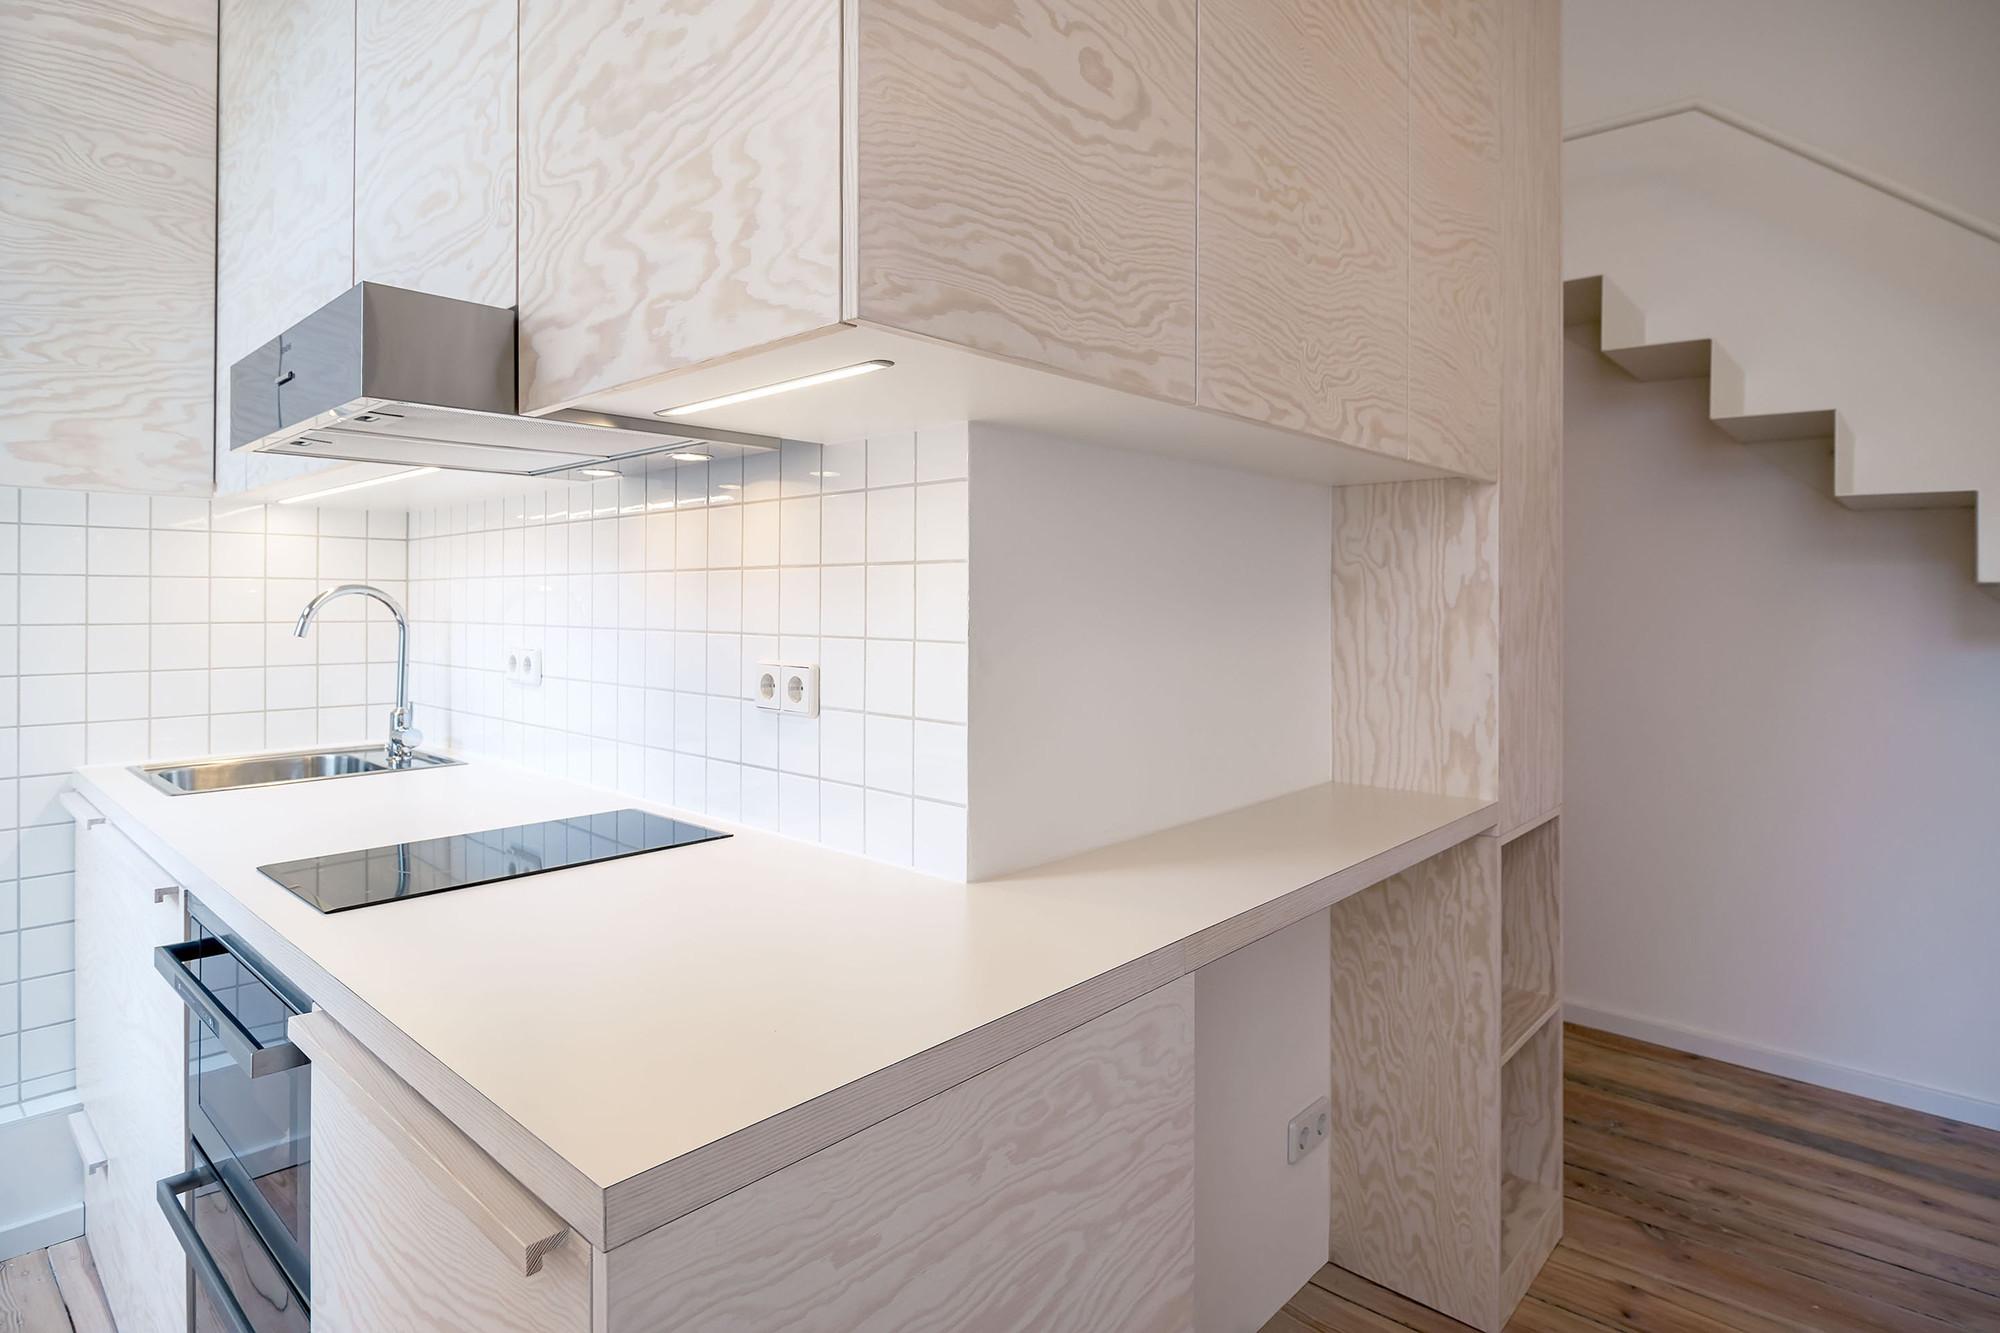 micro apartment in berlin 3 Micro apartment in Berlin